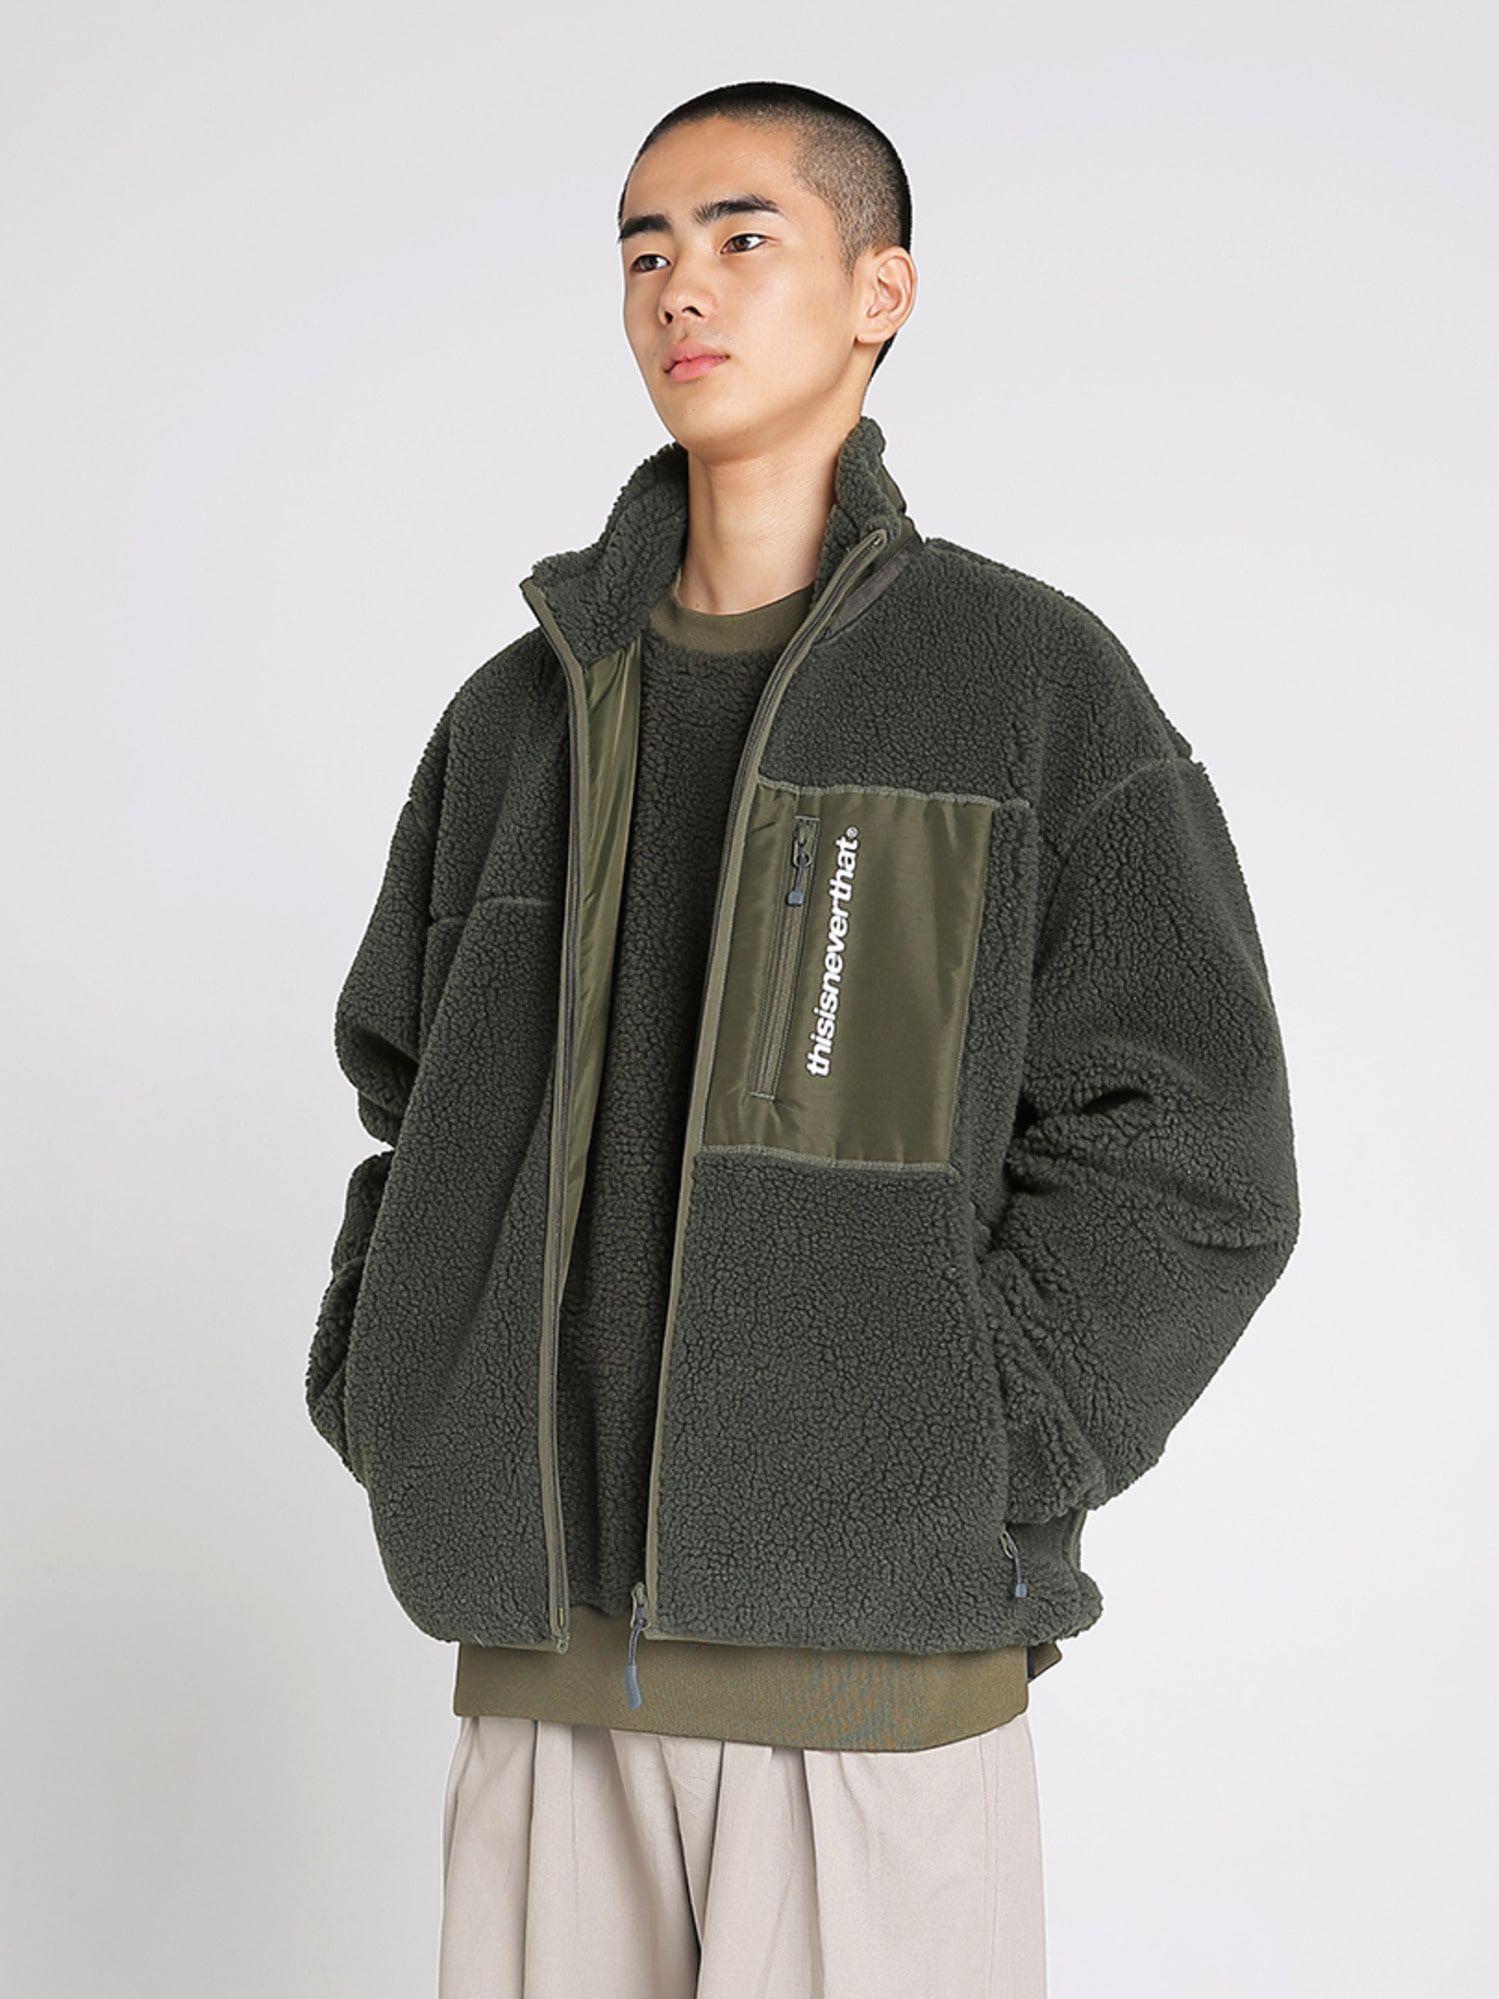 SP Boa Fleece Jacket Olive Mens fleece jacket, Jackets